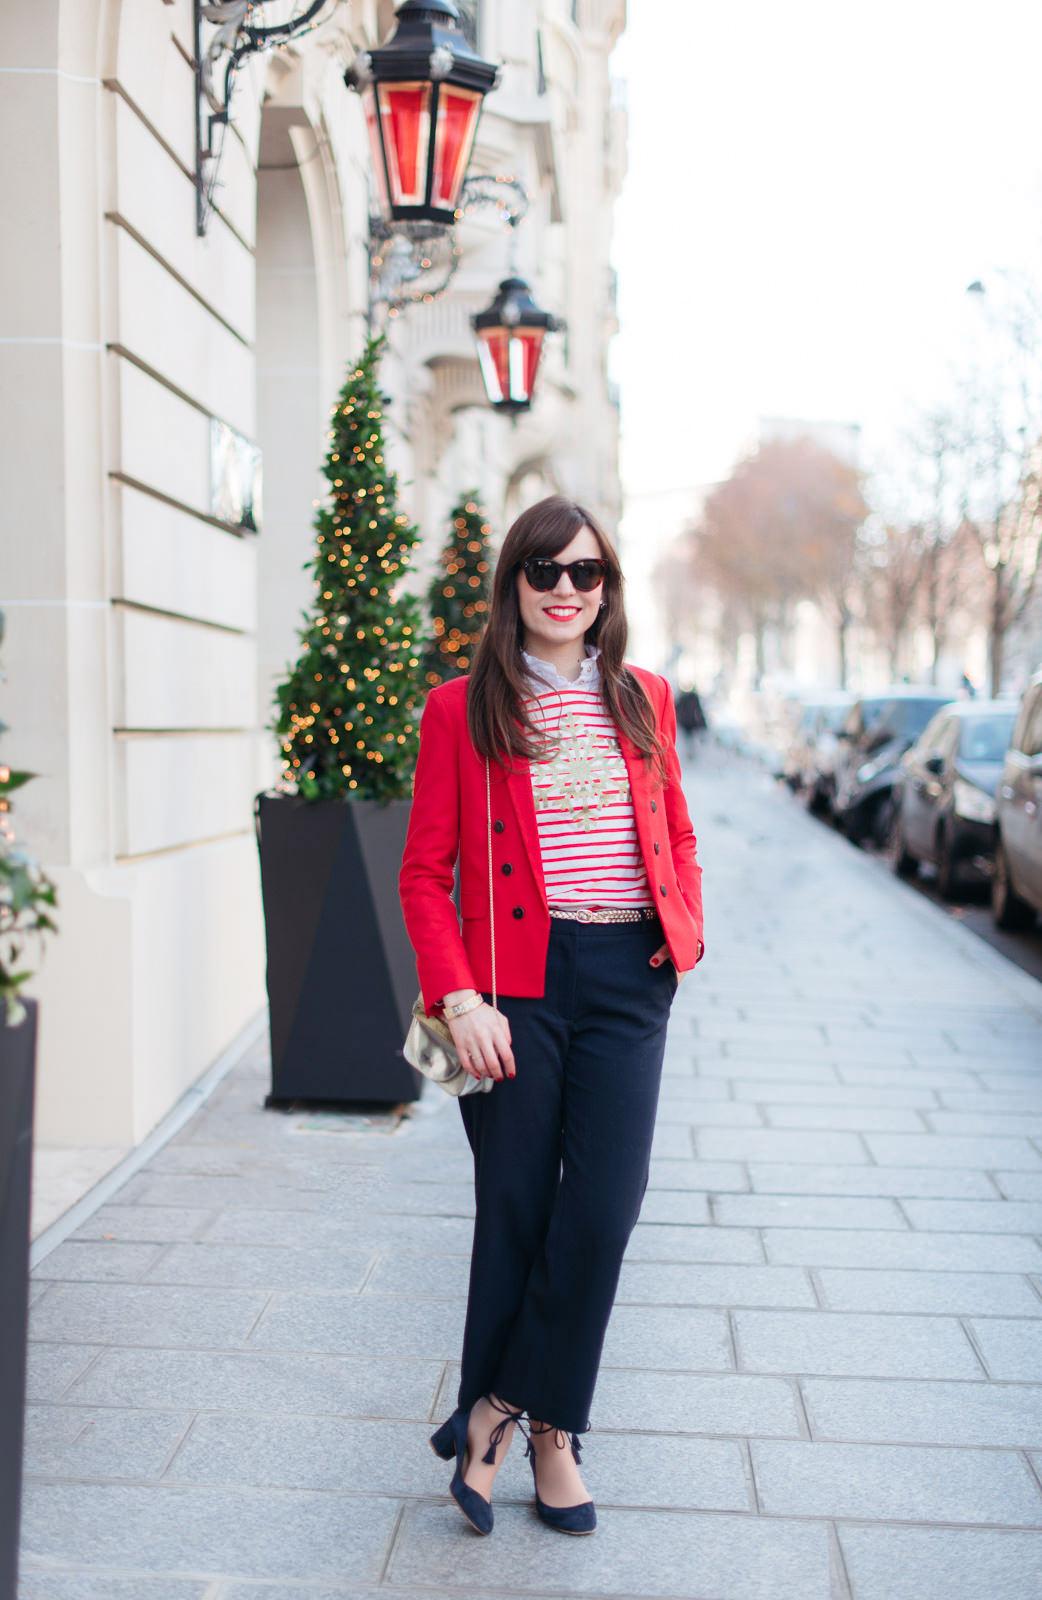 Blog-Mode-And-The-City-Looks-Mariniere-de-Noel-4